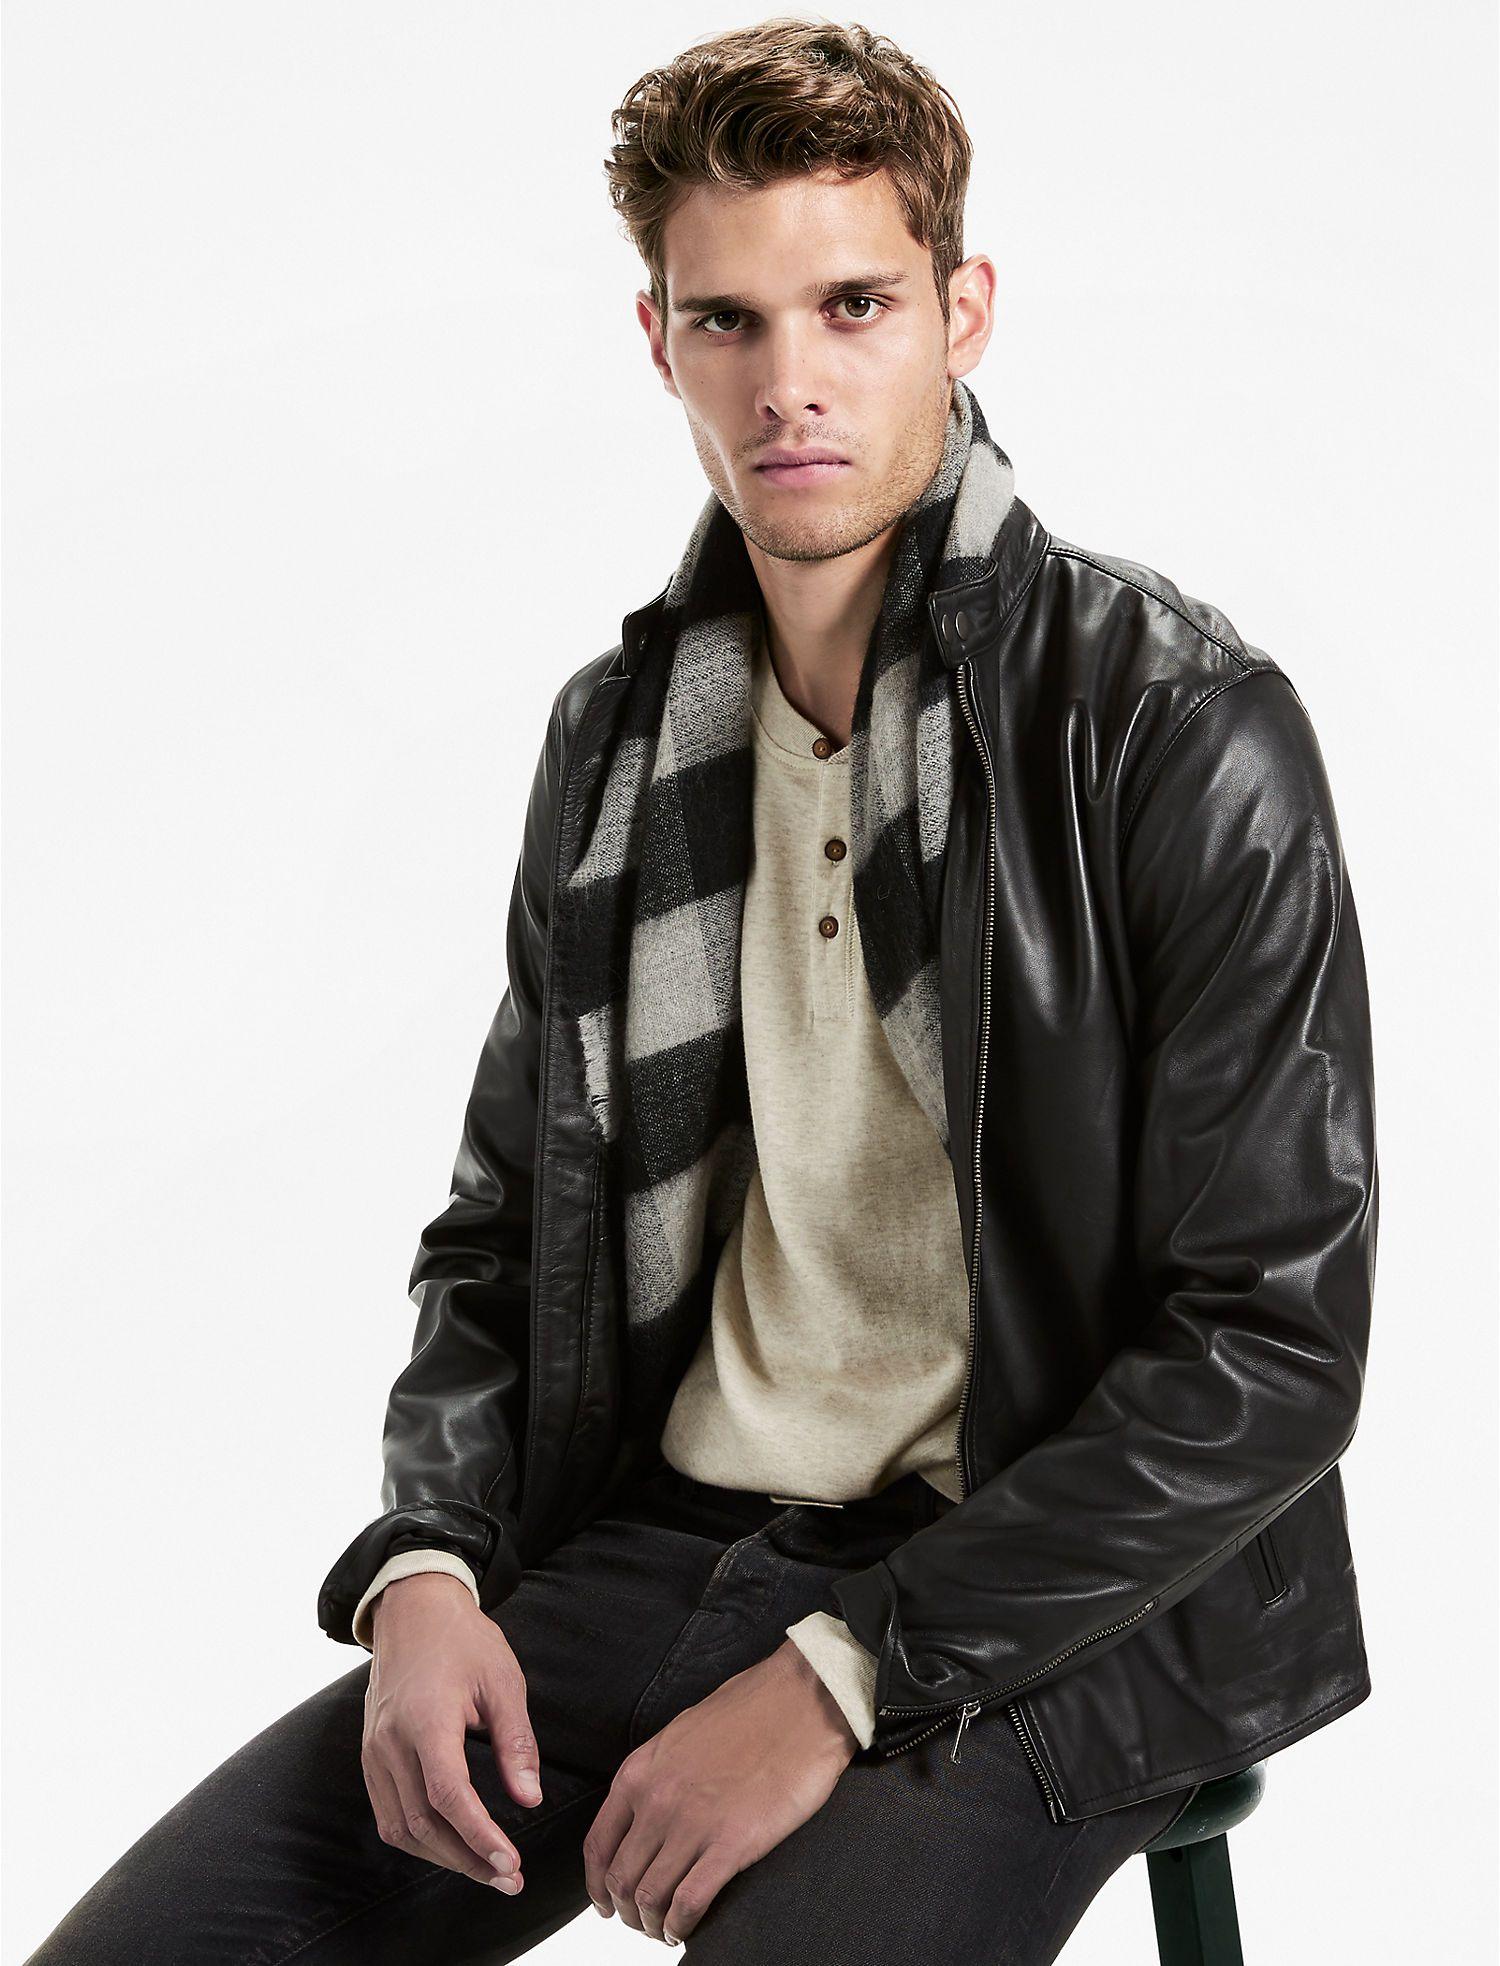 26 Cute Big And Tall Leather Motorcycle Jackets Smart Ideas Big And Stylish Villa Margherita Bon Leather Jacket Outfit Men Leather Jacket Buy Leather Jacket [ jpg ]